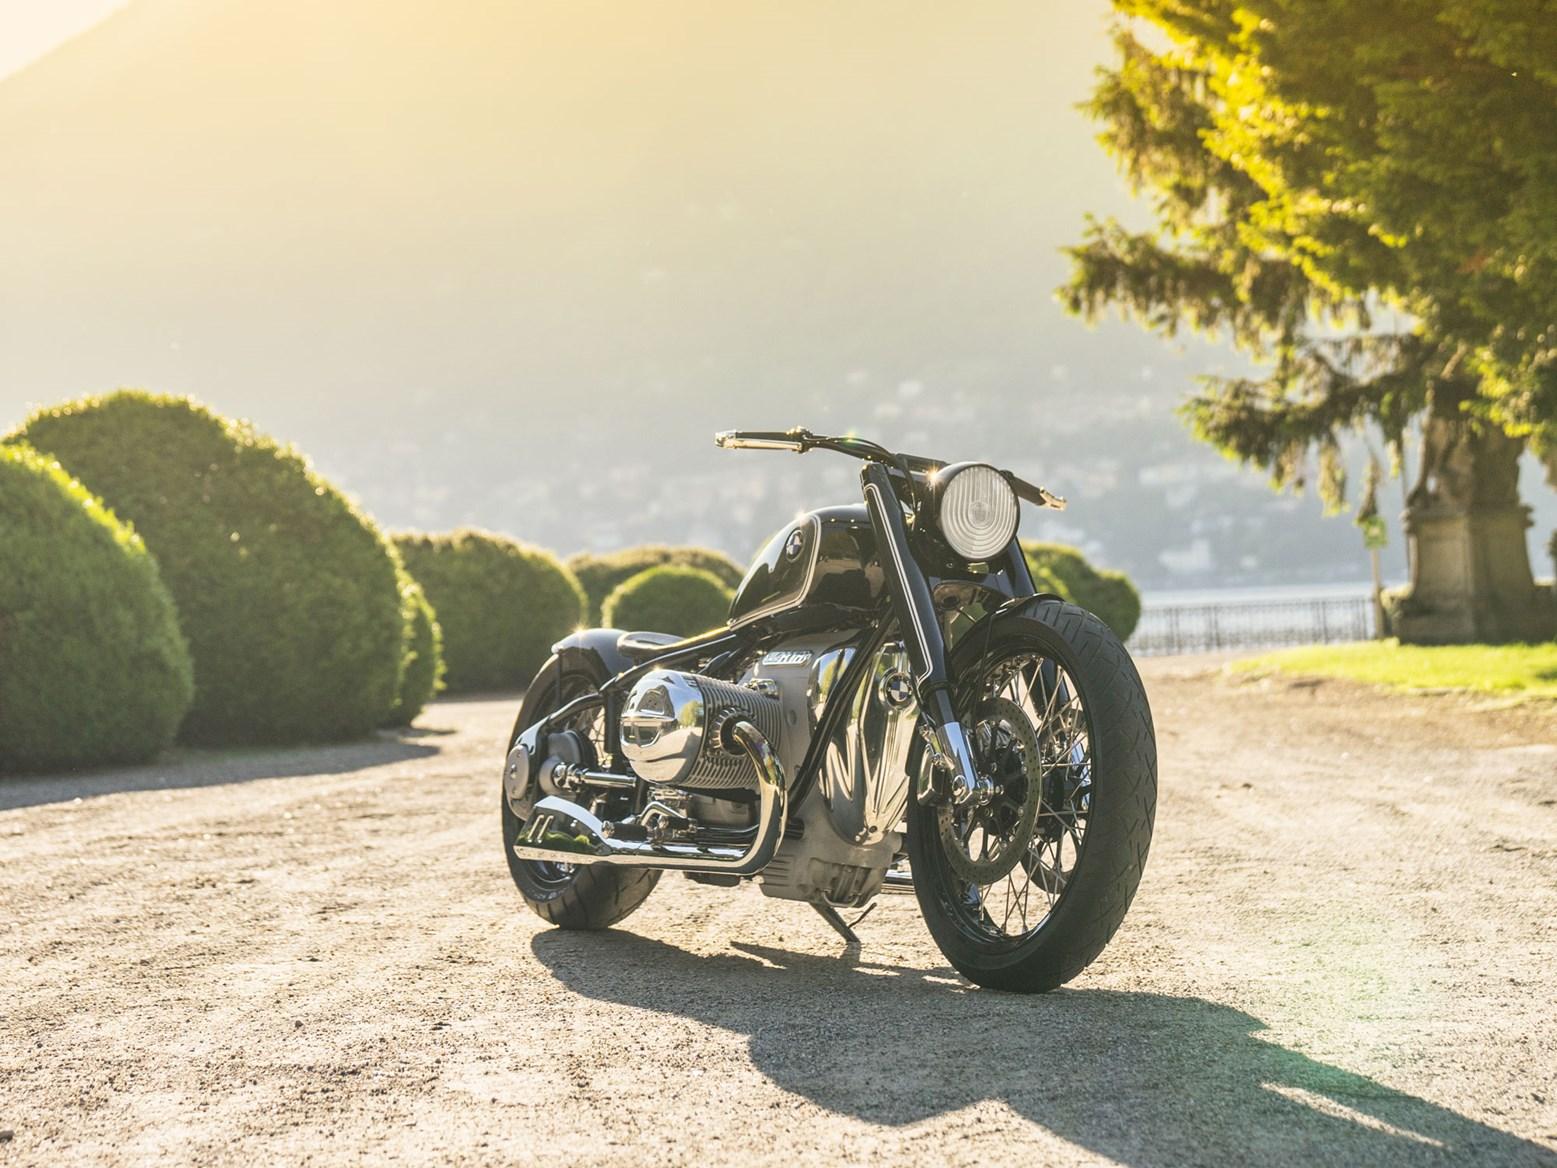 Big 1,800cc Cruiser Coming From BMW (Bike Reports) (News)